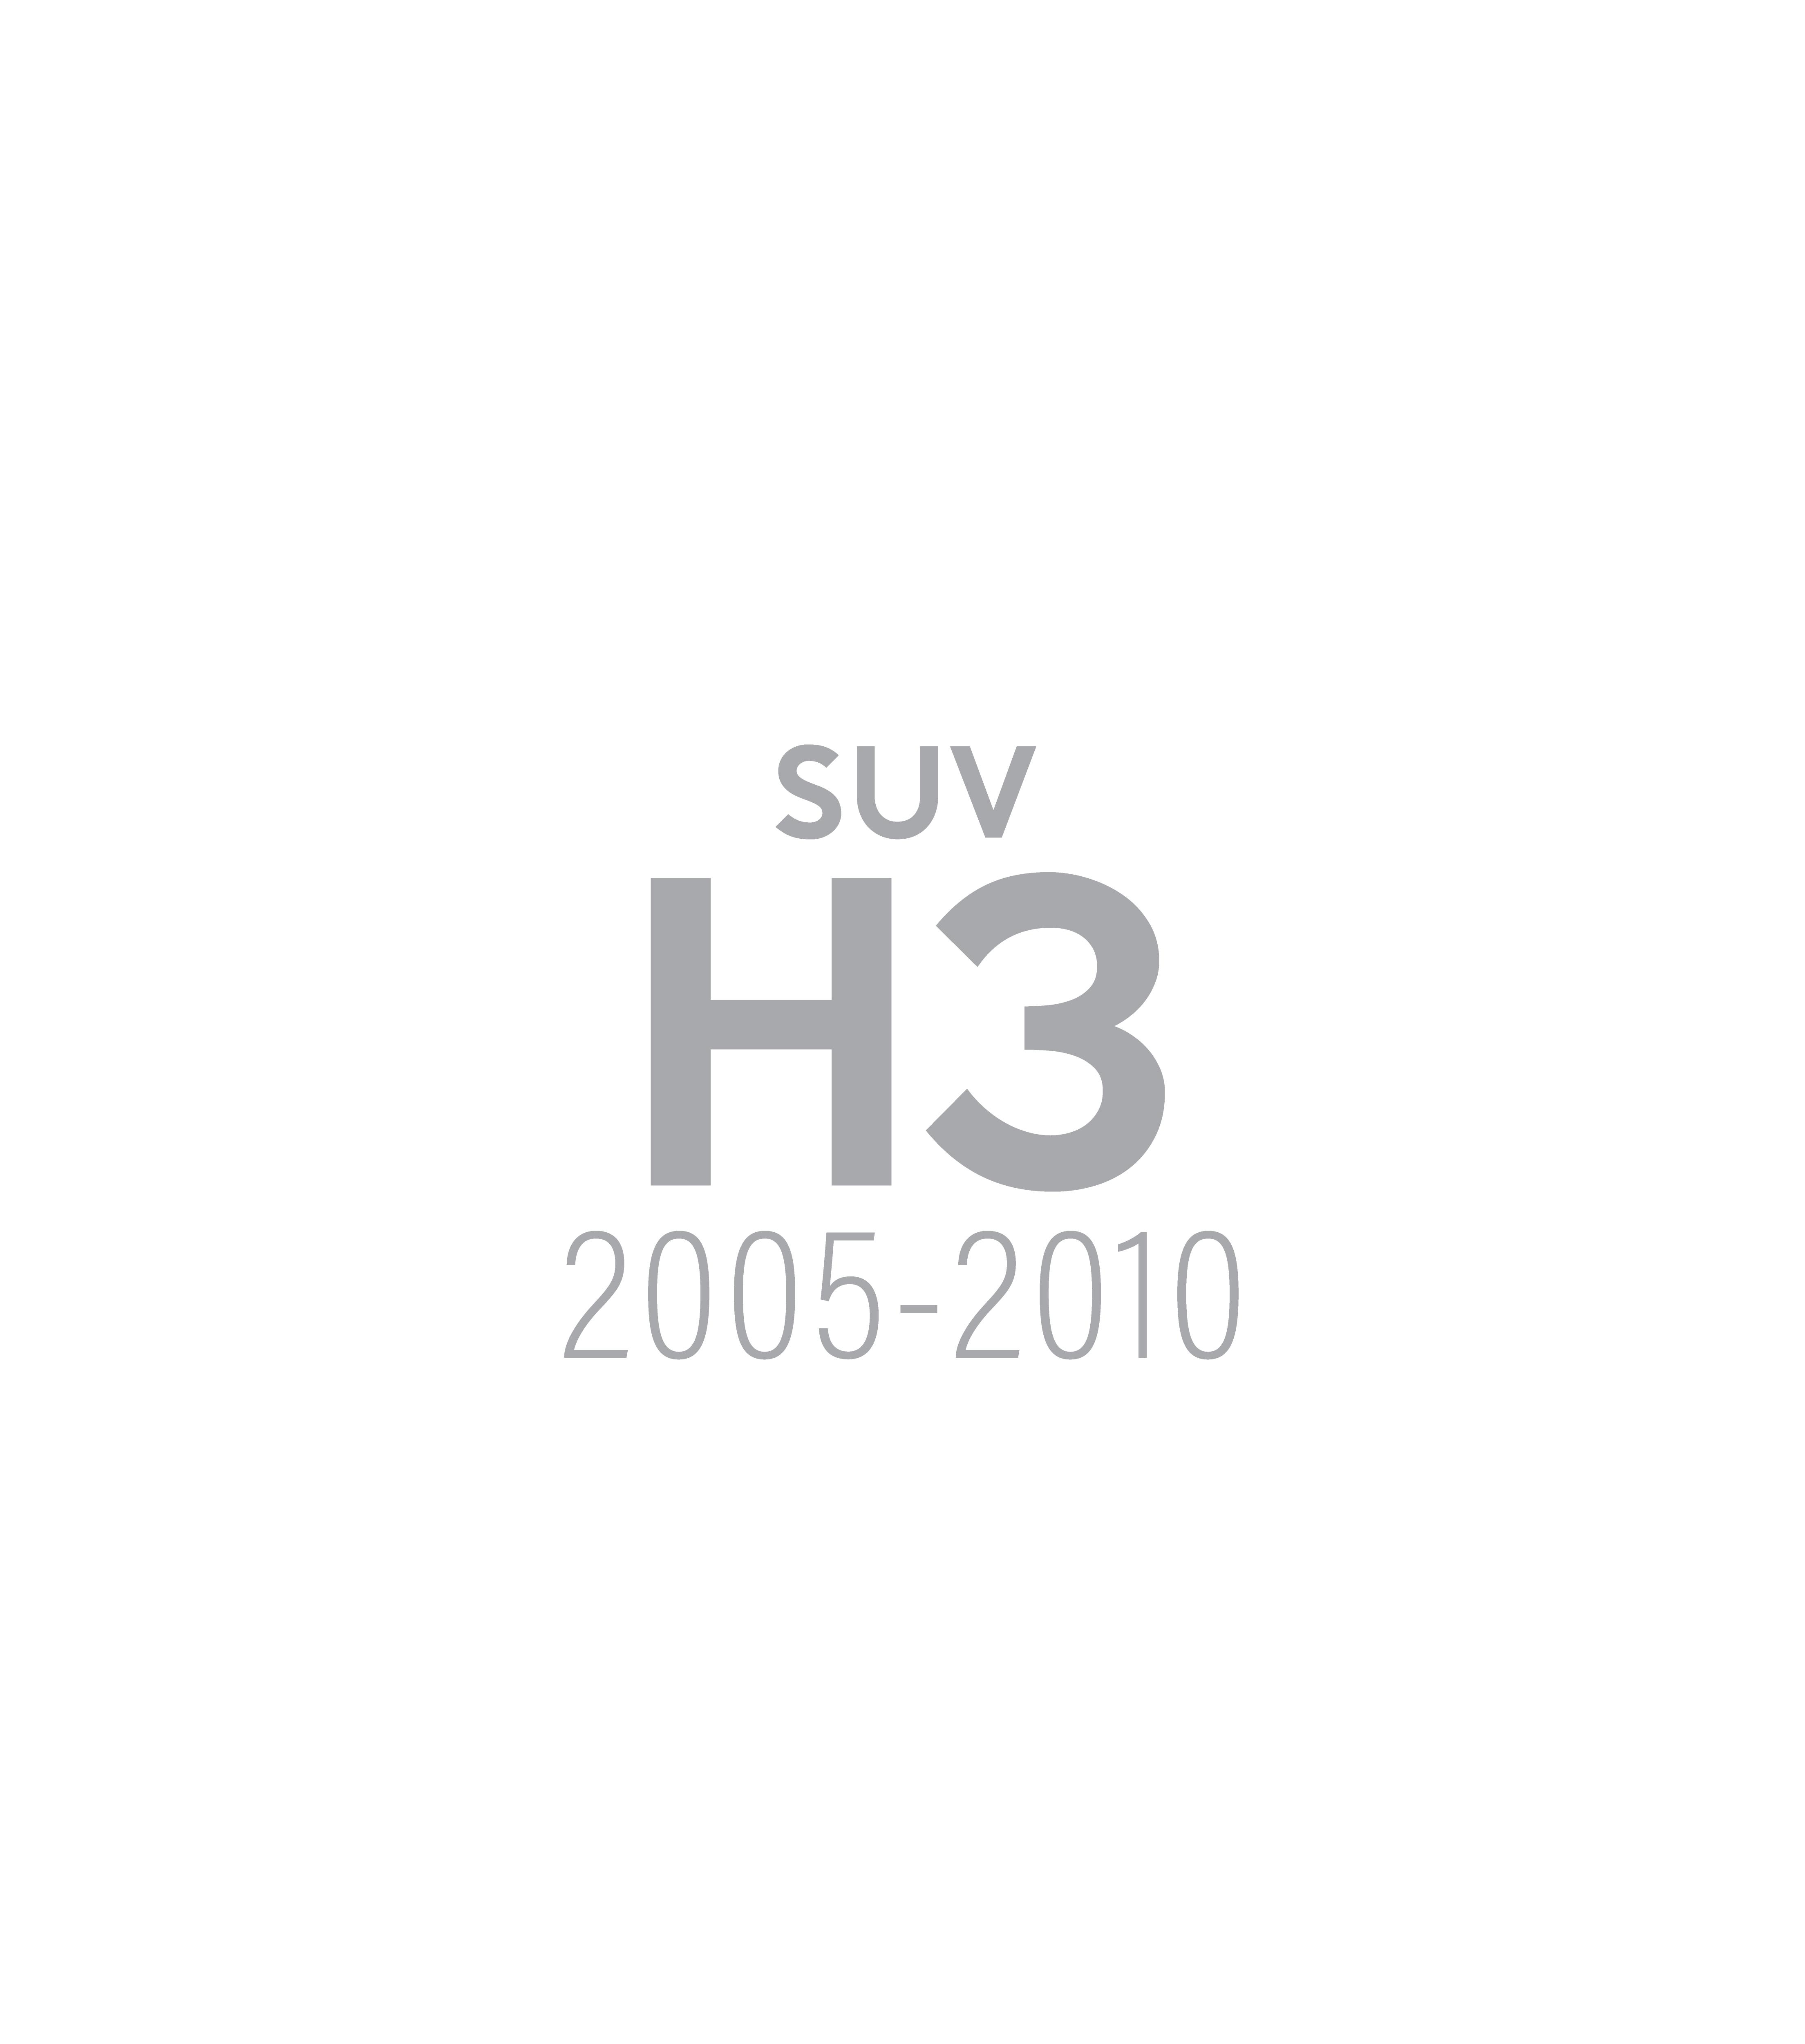 hummer H3 suv gobi gallery image